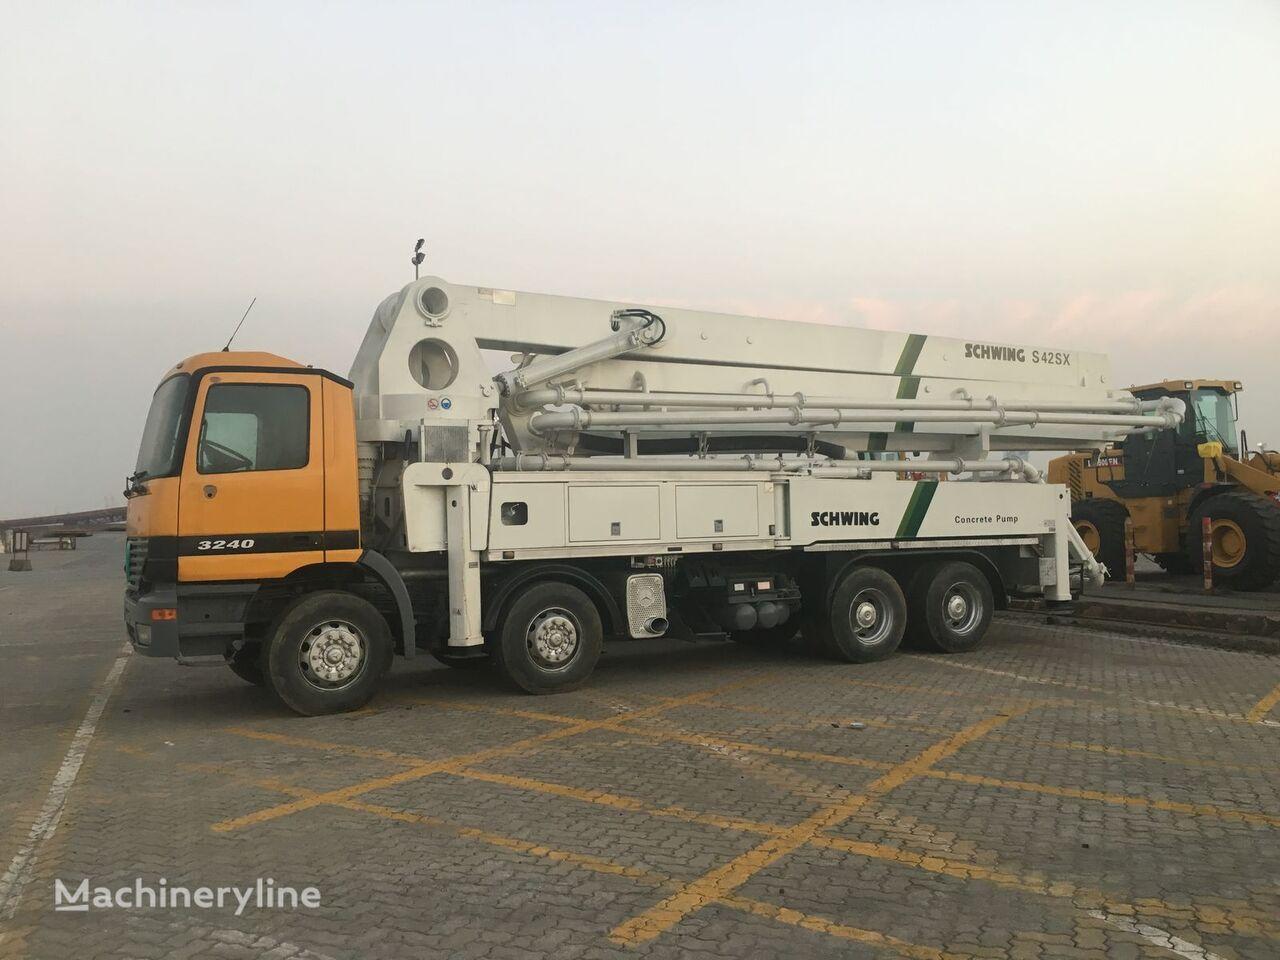 SCHWING s42M concrete pump